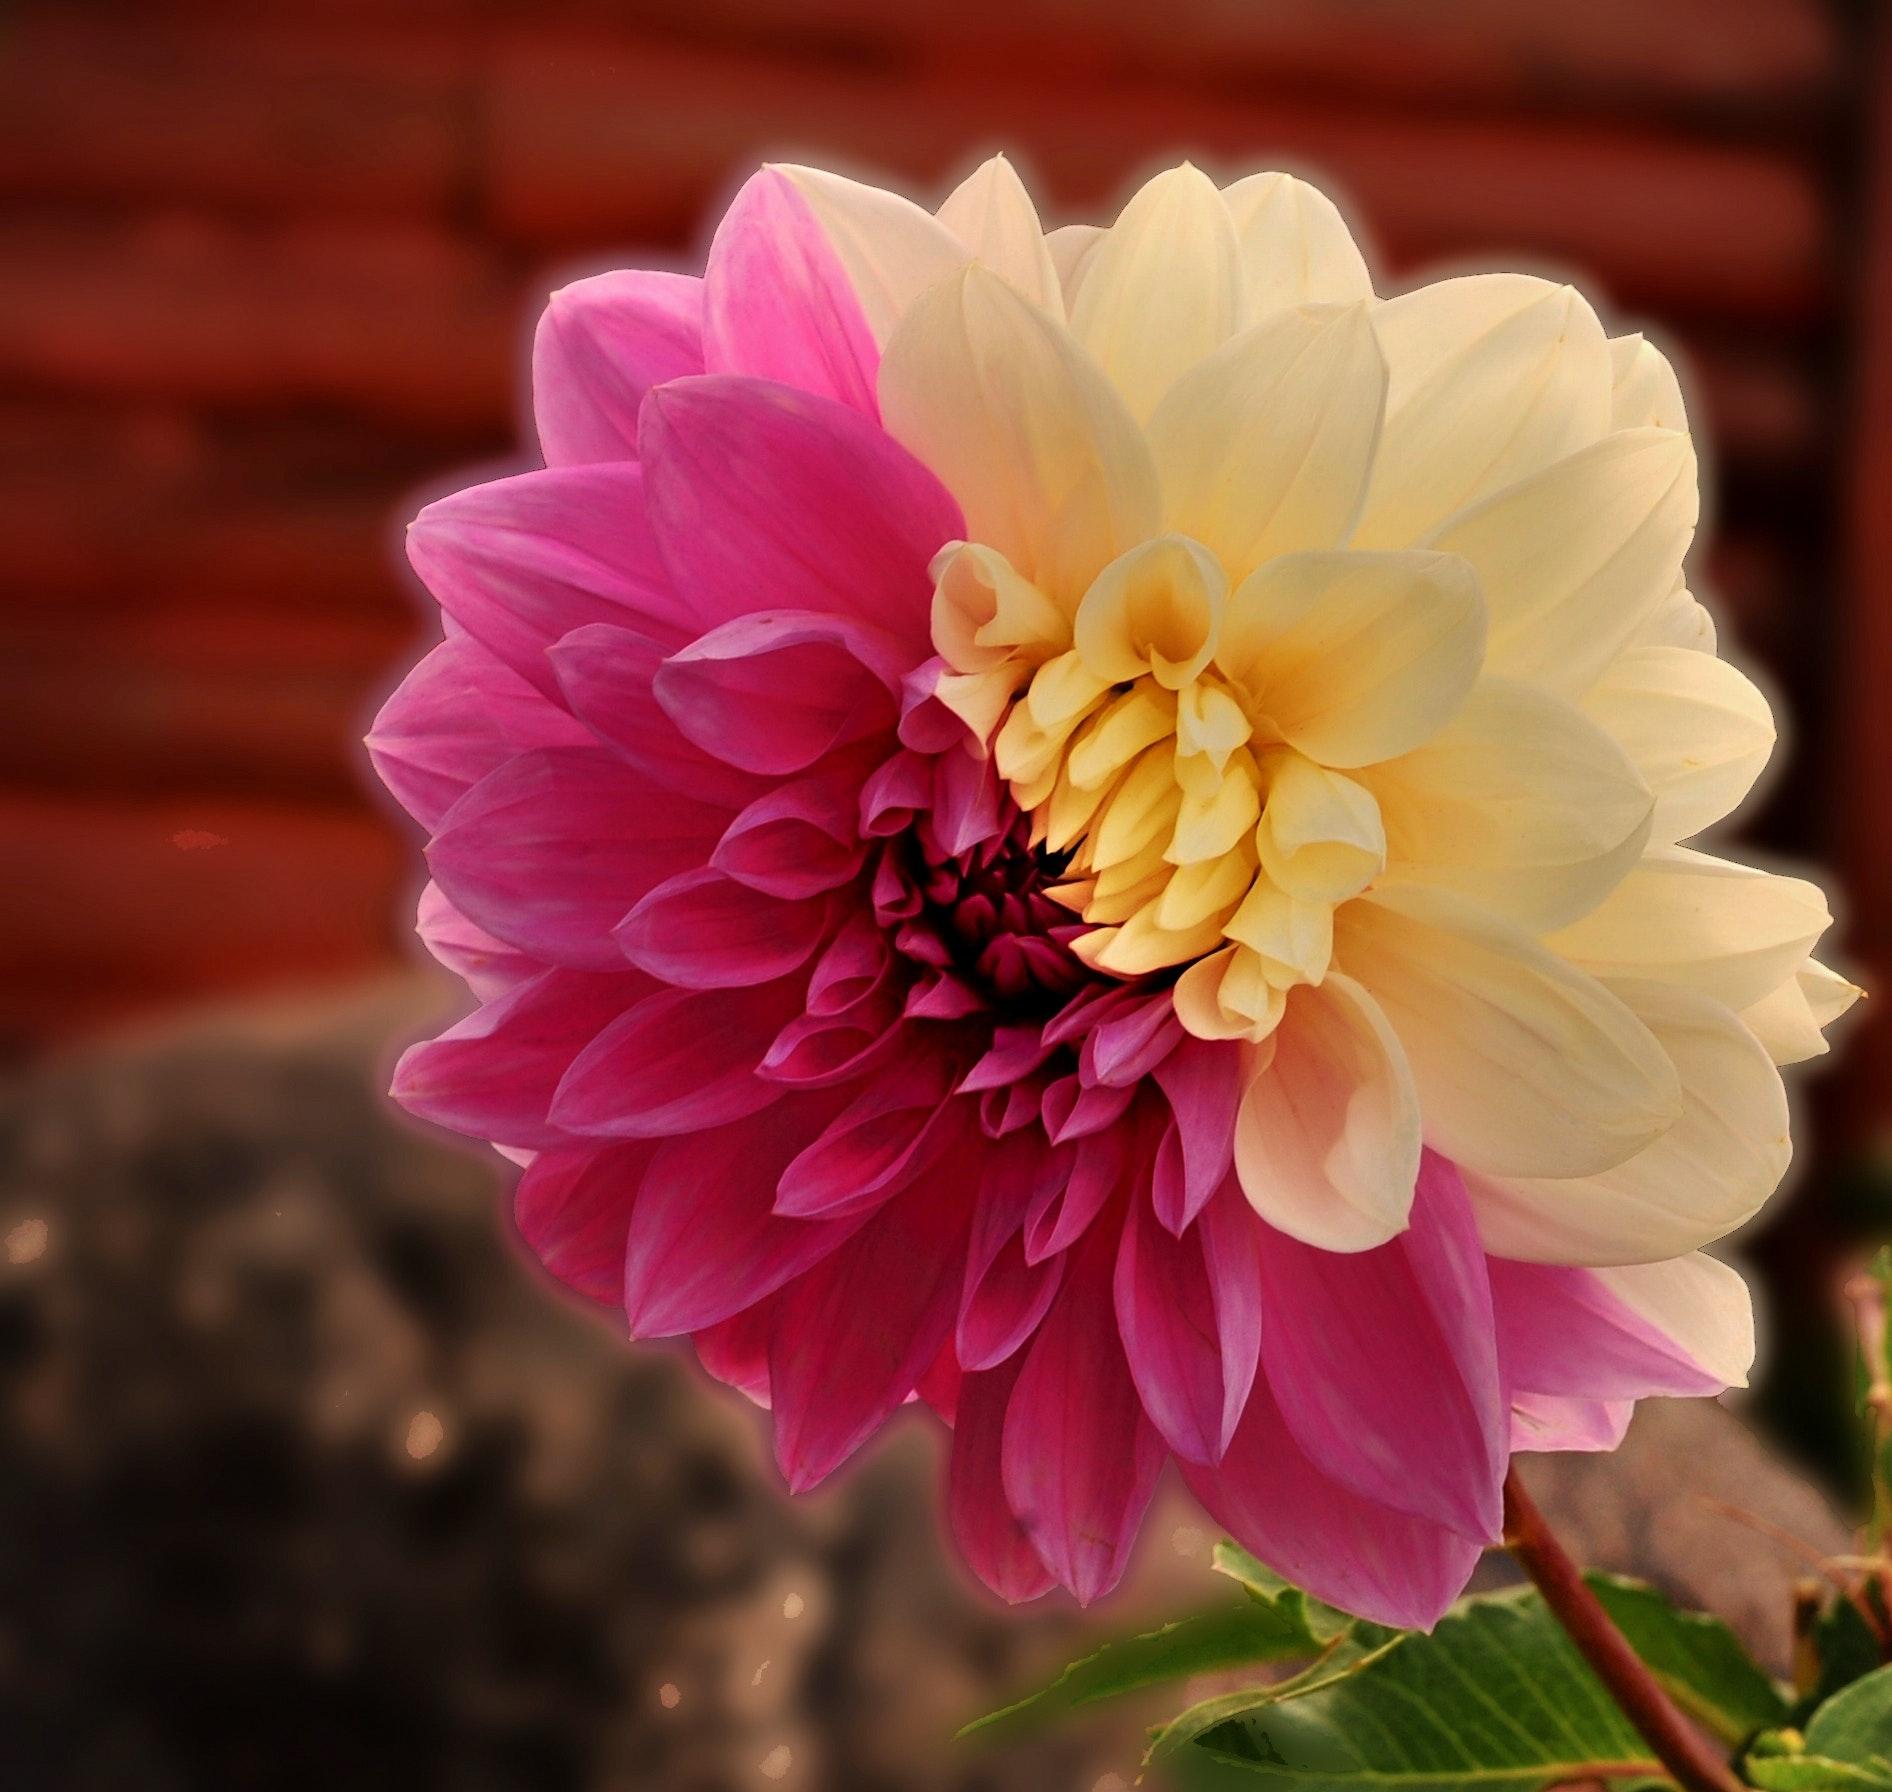 Free stock photo of dahlia flower split tone flower free download izmirmasajfo